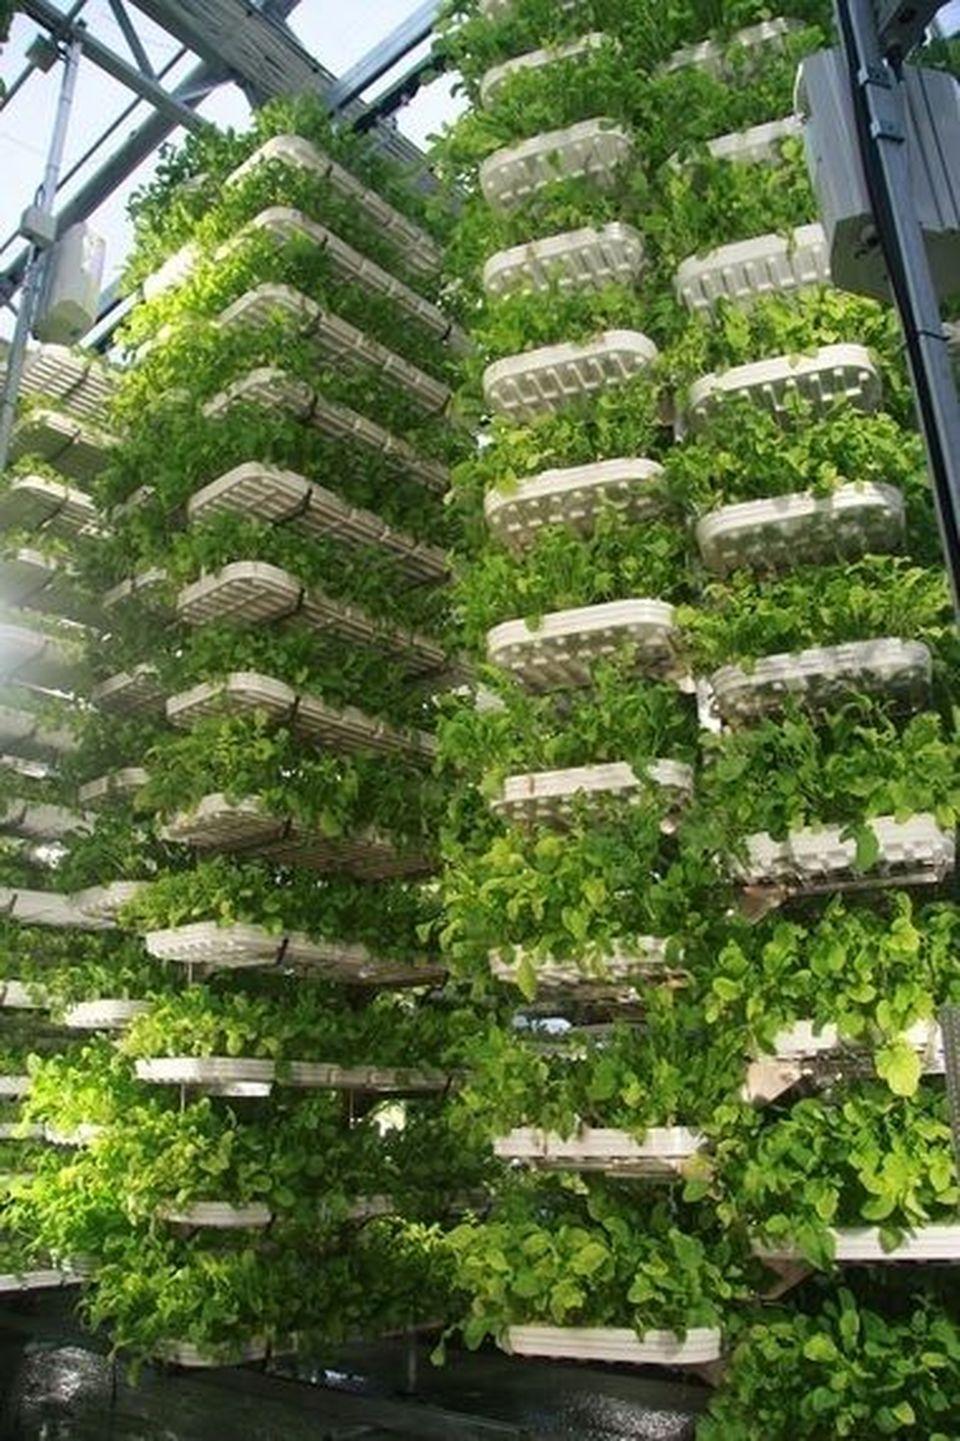 40 Inspiring Vertical Garden Ideas For Small Space Hoommy Com Vertical Garden Vertical Farming Hydroponic Farming,Brown Shades Chocolate Brown Hair Color 2020